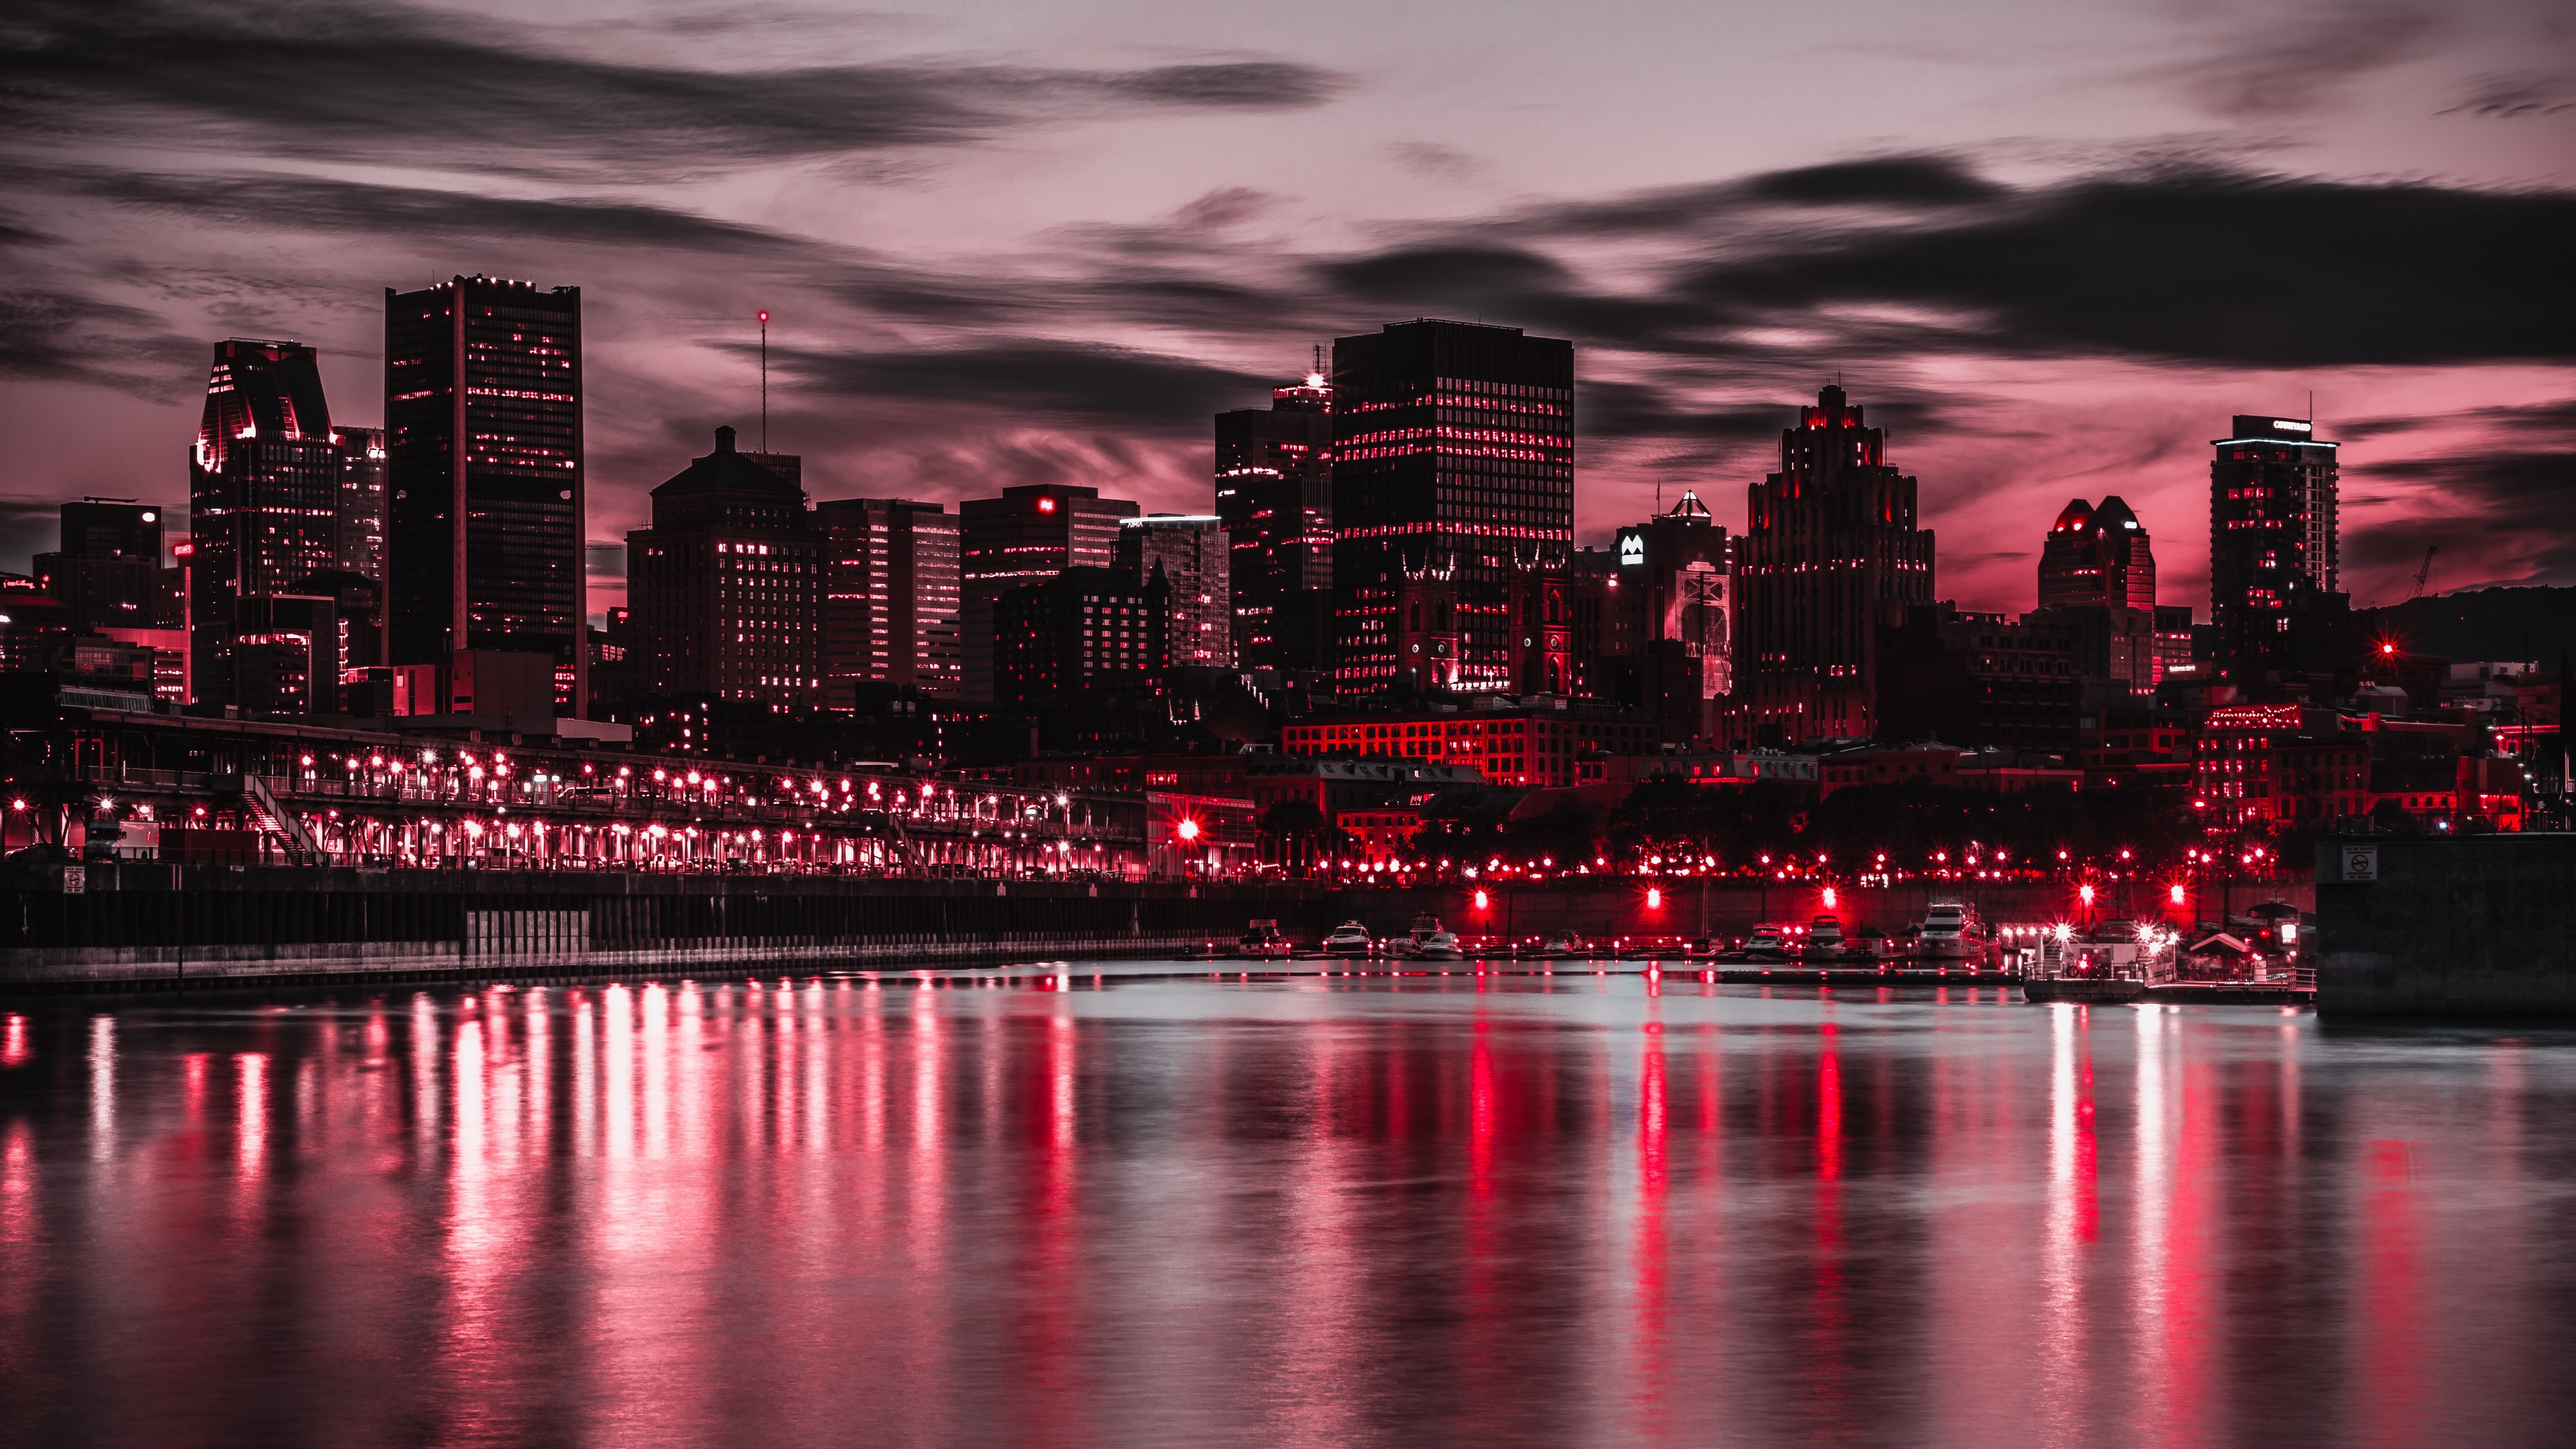 night city, city lights, buildings, shore, night 4k night ...